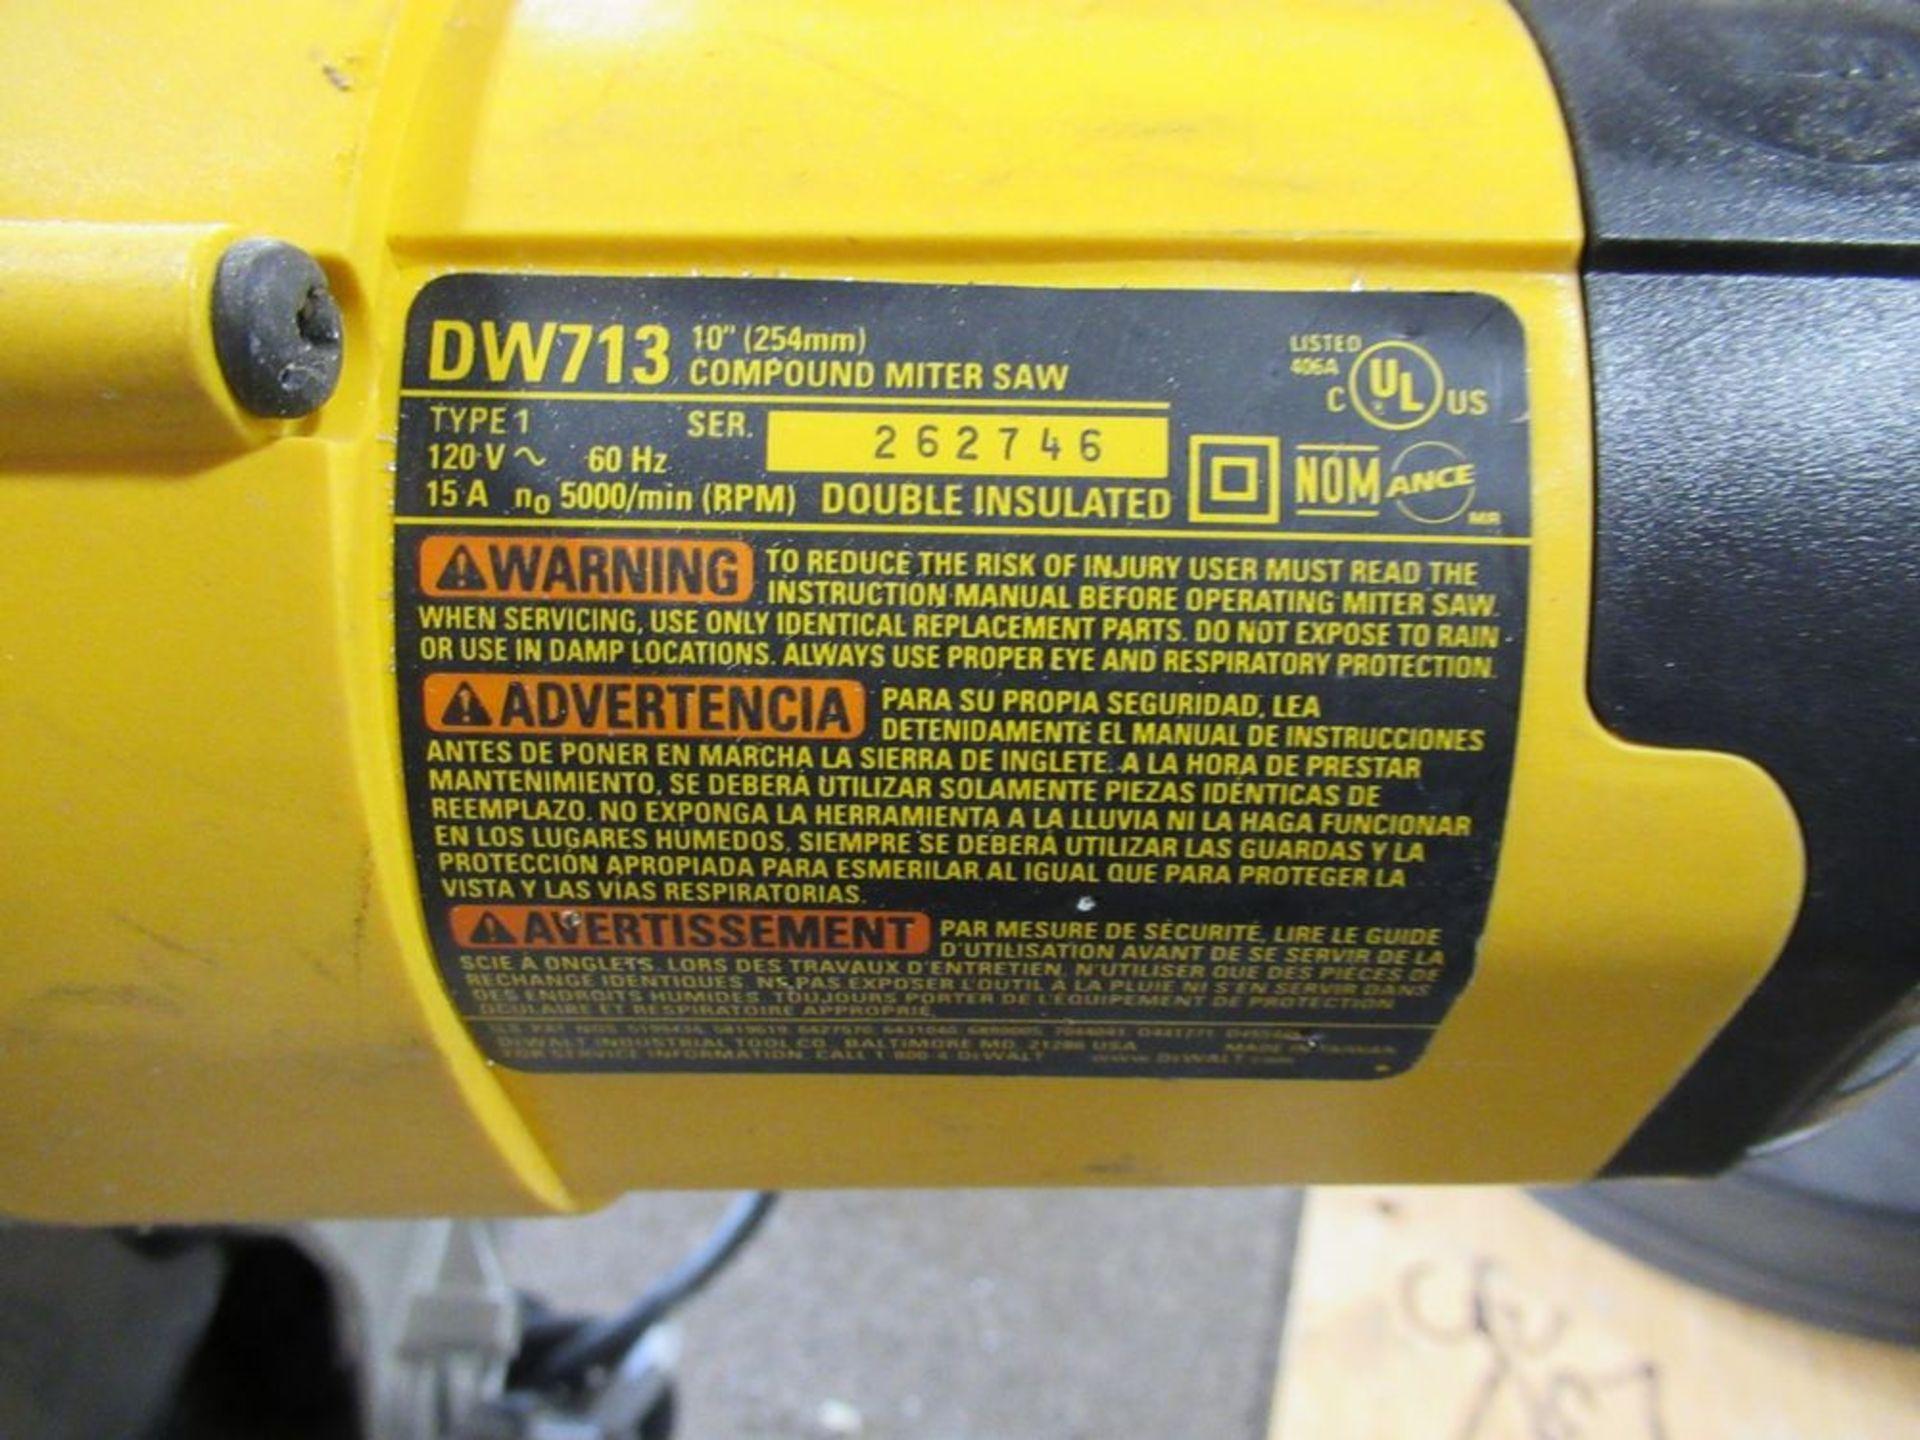 "DEWALT DW-713 10"" COMPOUND MITRE SAW, S/N 262746 - Image 3 of 3"